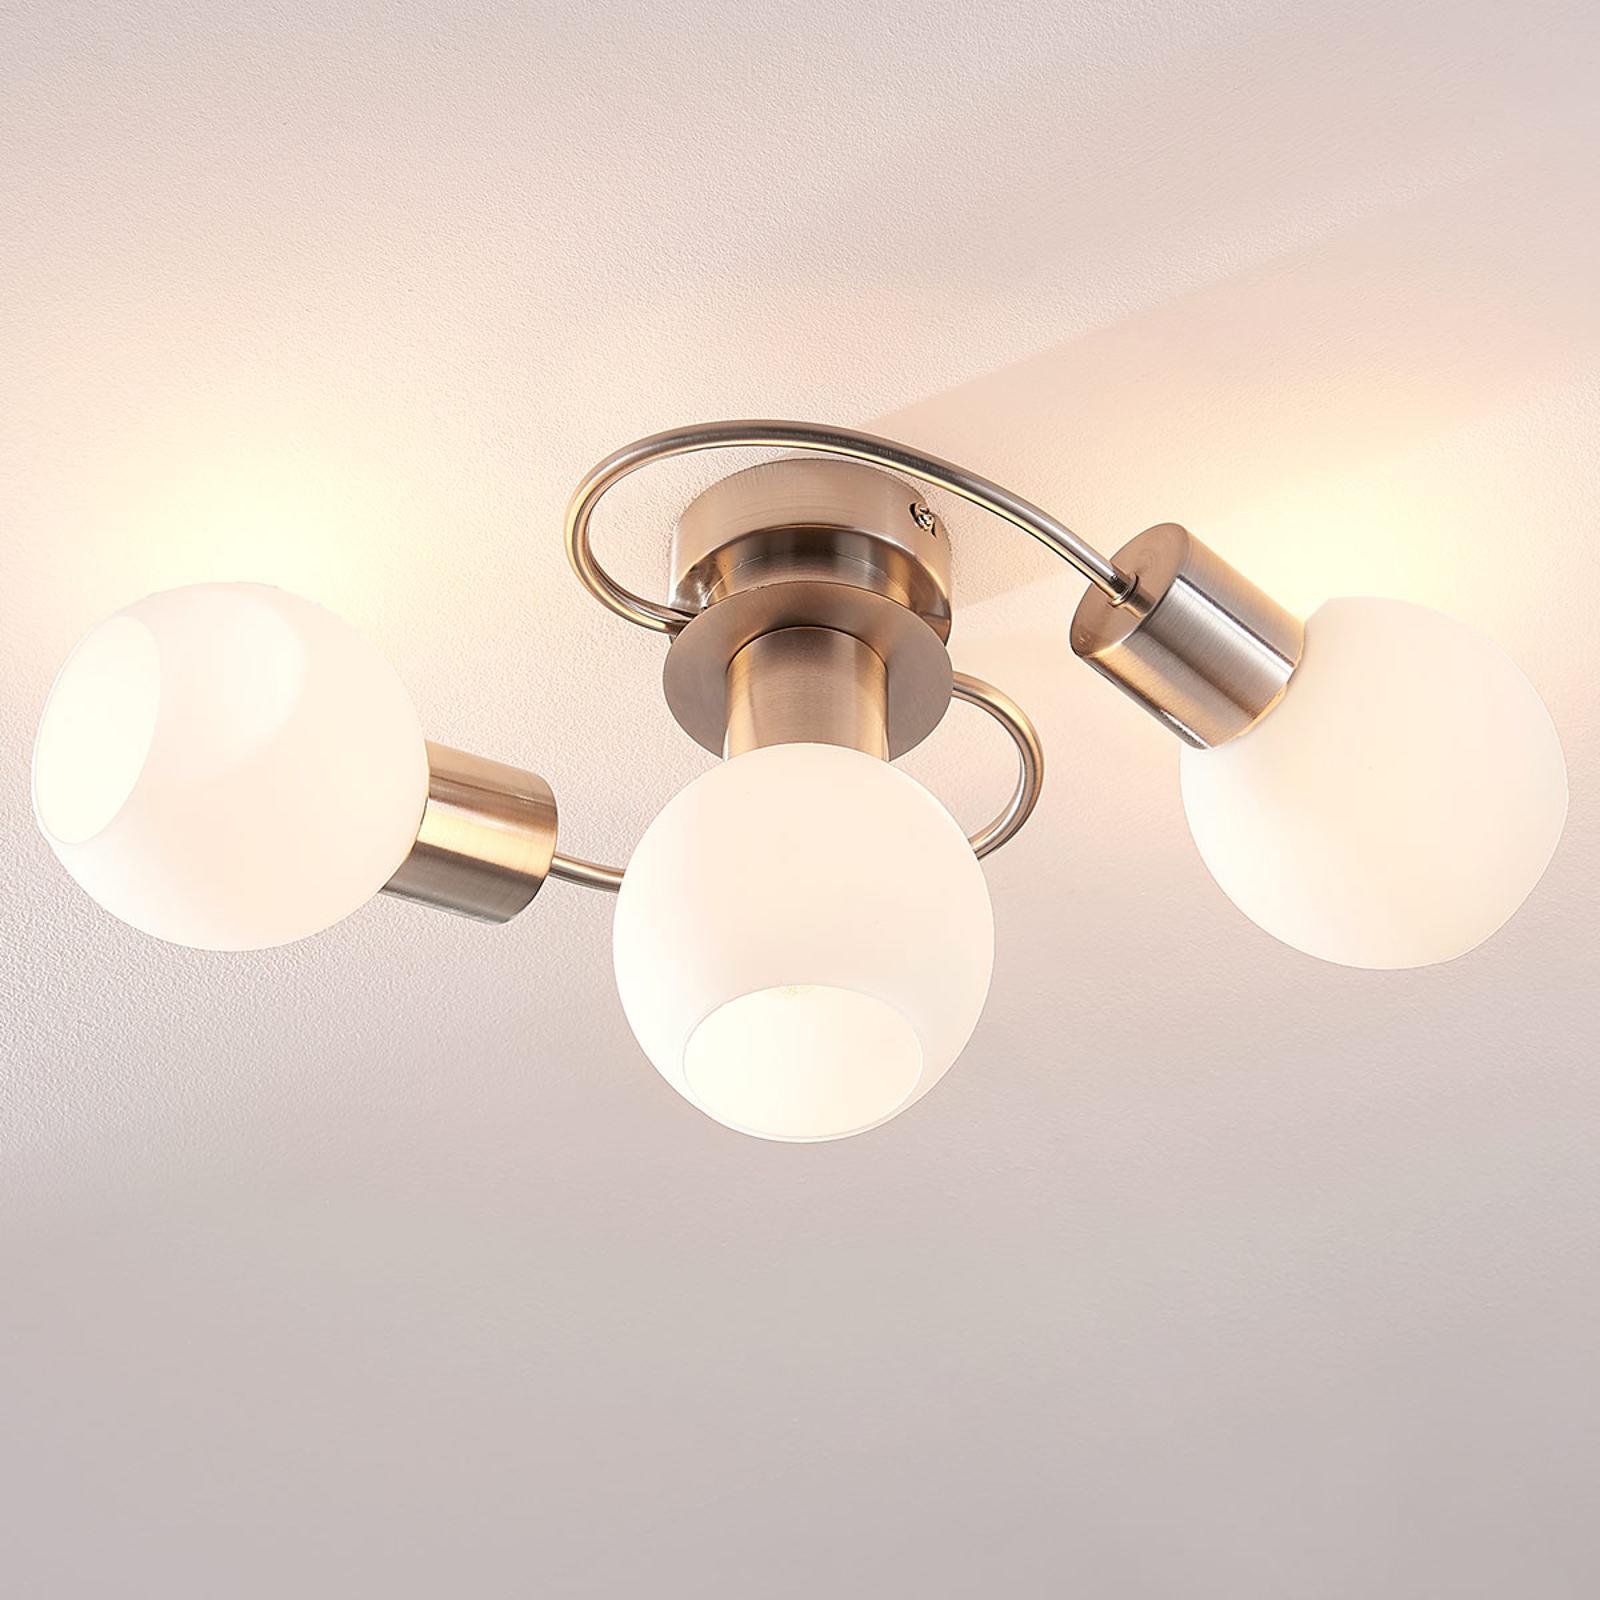 LED-Deckenleuchte Ciala, 3-flammig